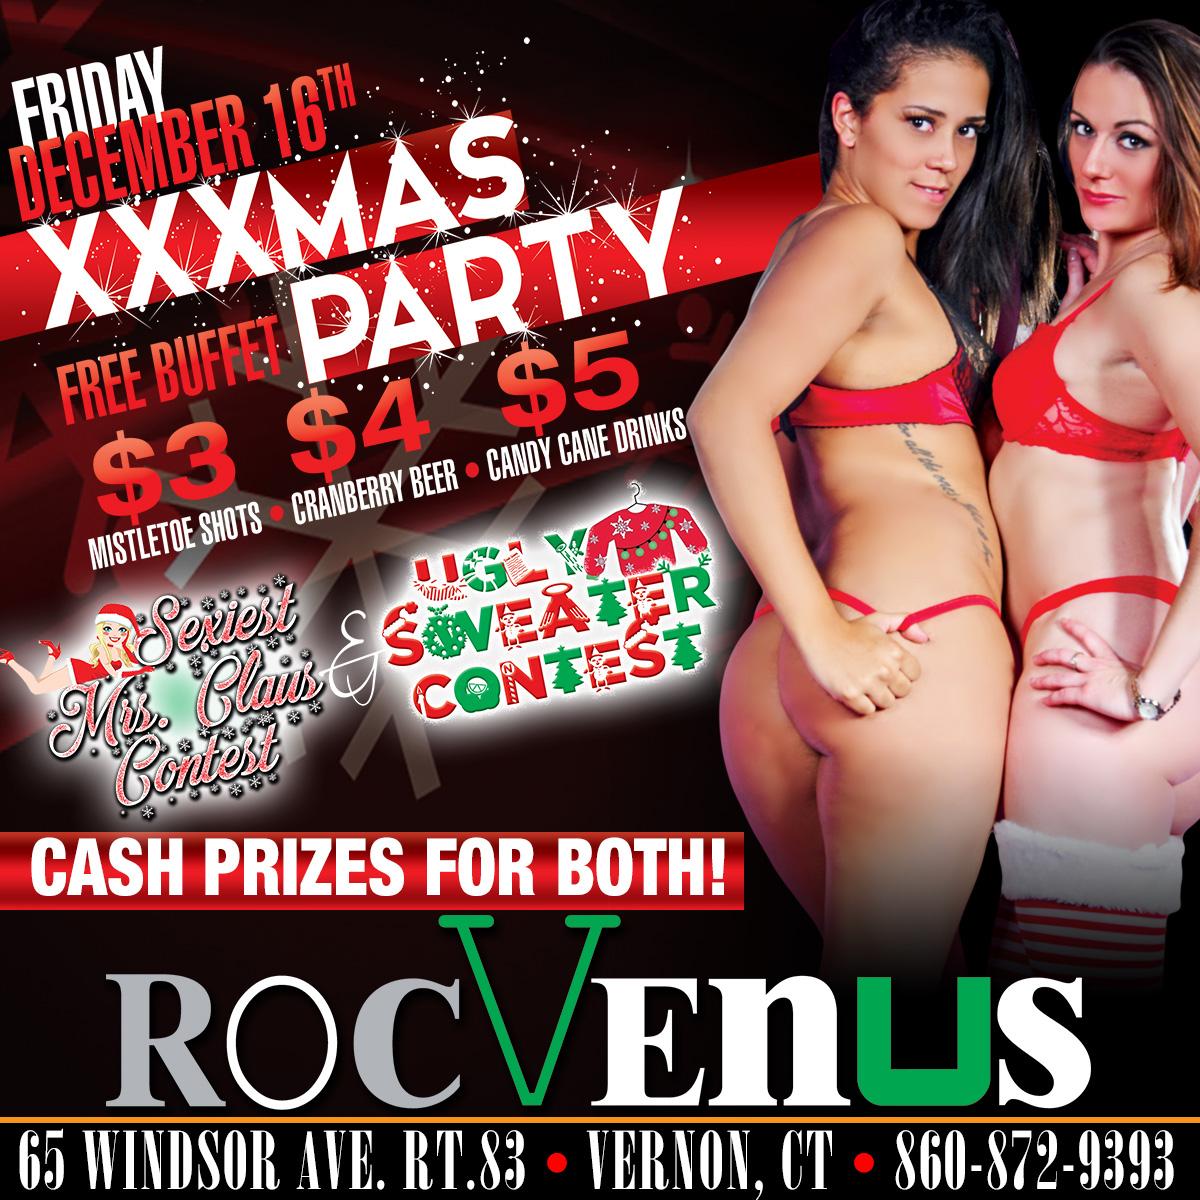 XXXMAS Party | RocVenus Strip Club Connecticut